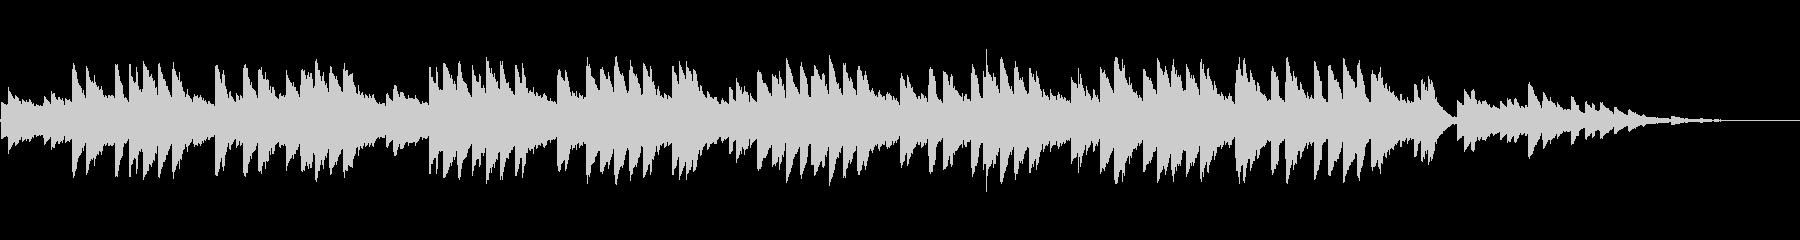 8bitクラシック-歌の翼に-の未再生の波形